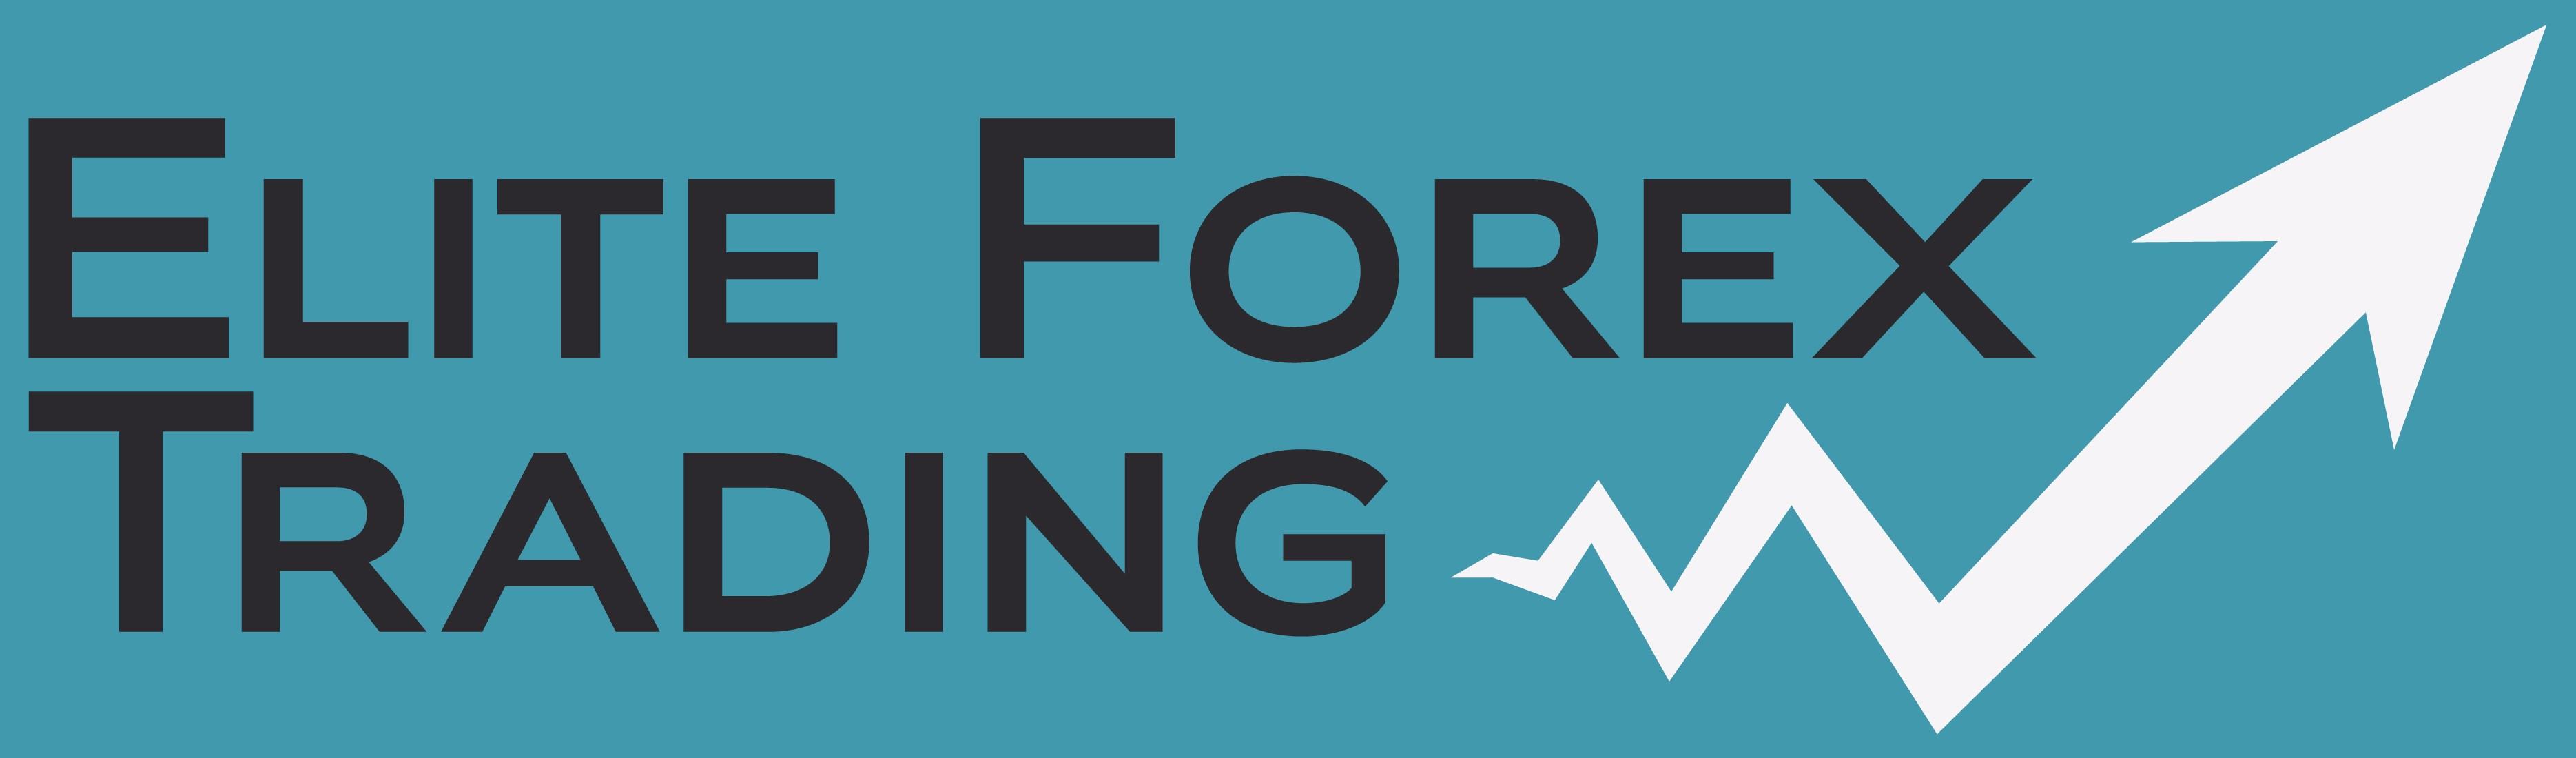 First forex